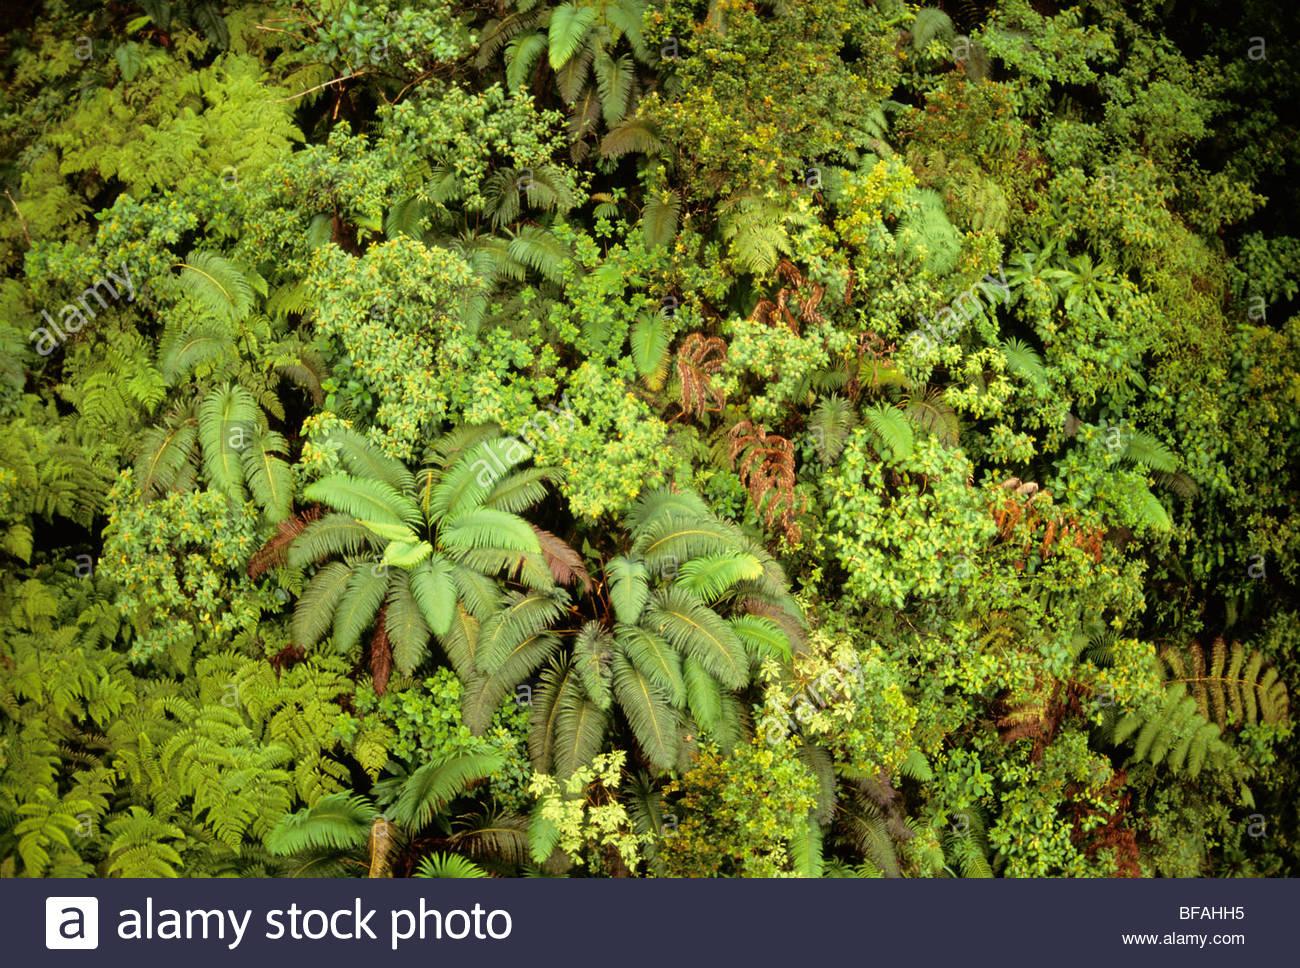 Ferns and other forest vegetation, Wai Ale Ale, Kauai, Hawaii - Stock Image